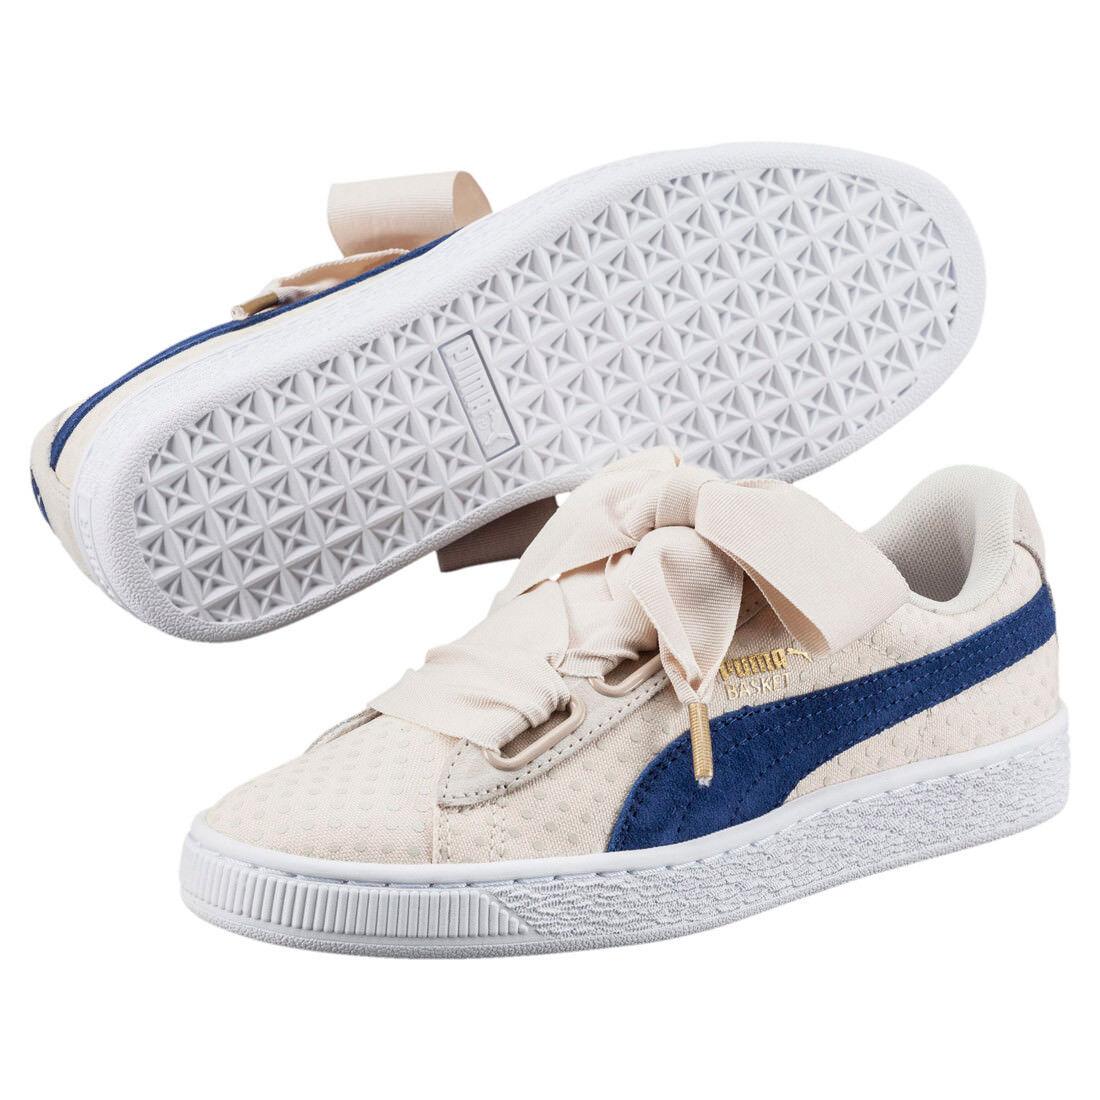 Puma Basket Heart Denim W Turnschuhe Damen Mädchen Schuhe 363371 03